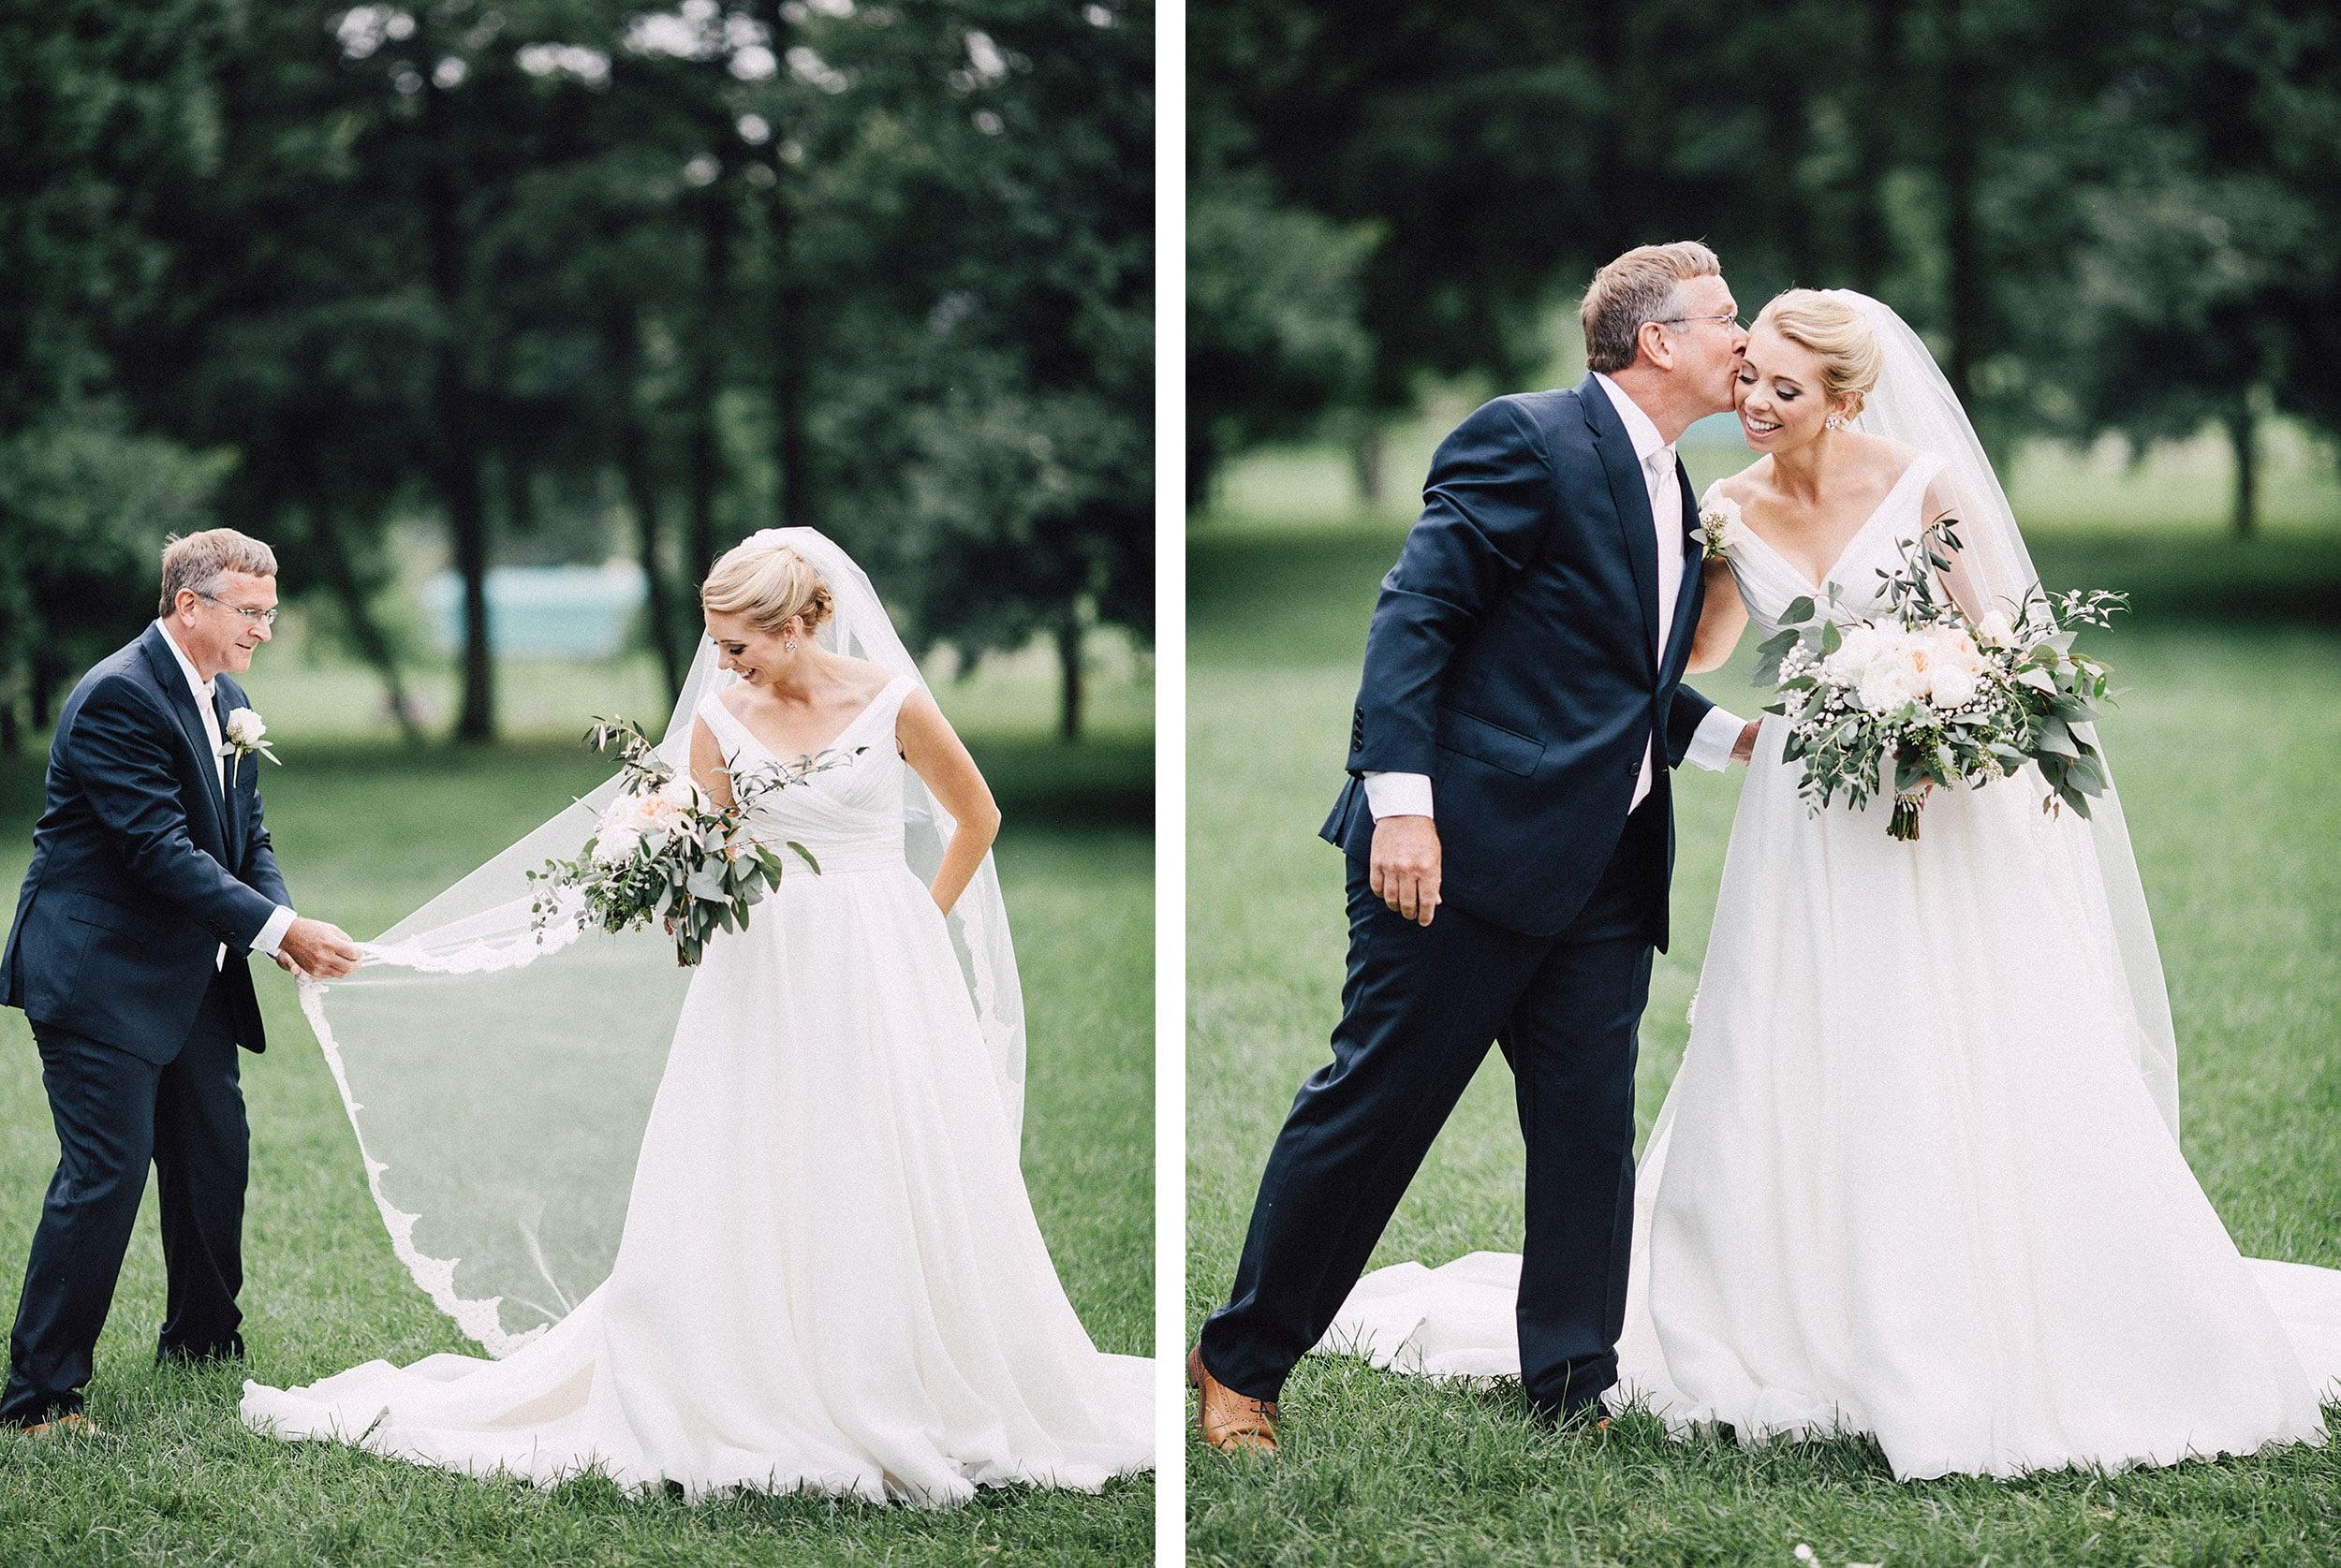 spindletop-lexington-wedding-photographer-022.JPG